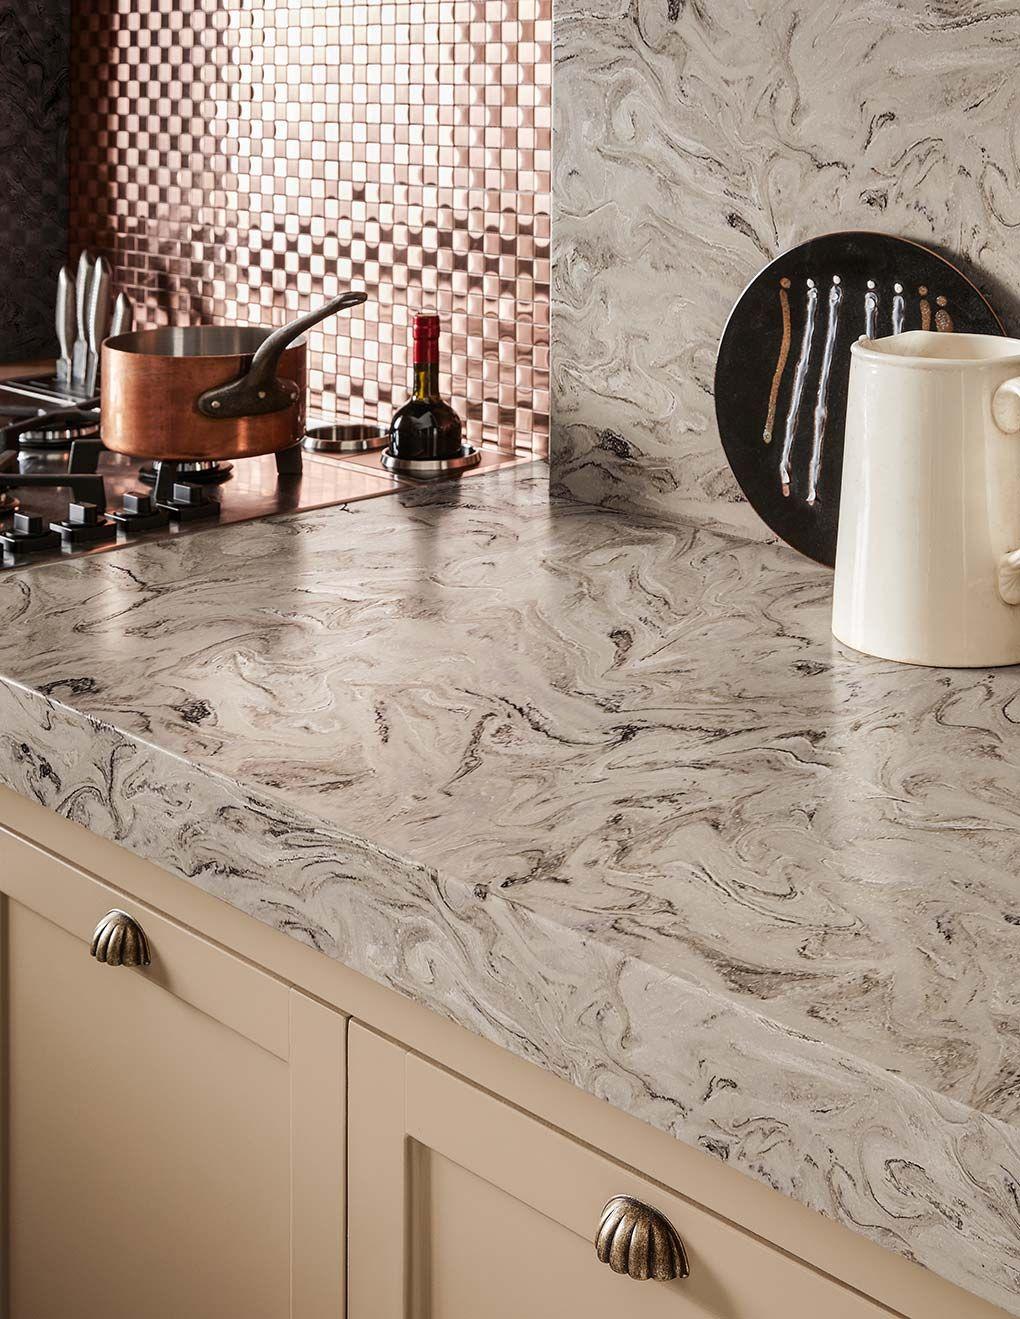 Prima Colours Of Corian Corian Corian Kitchen Countertops Kitchen Countertops Corian Countertops